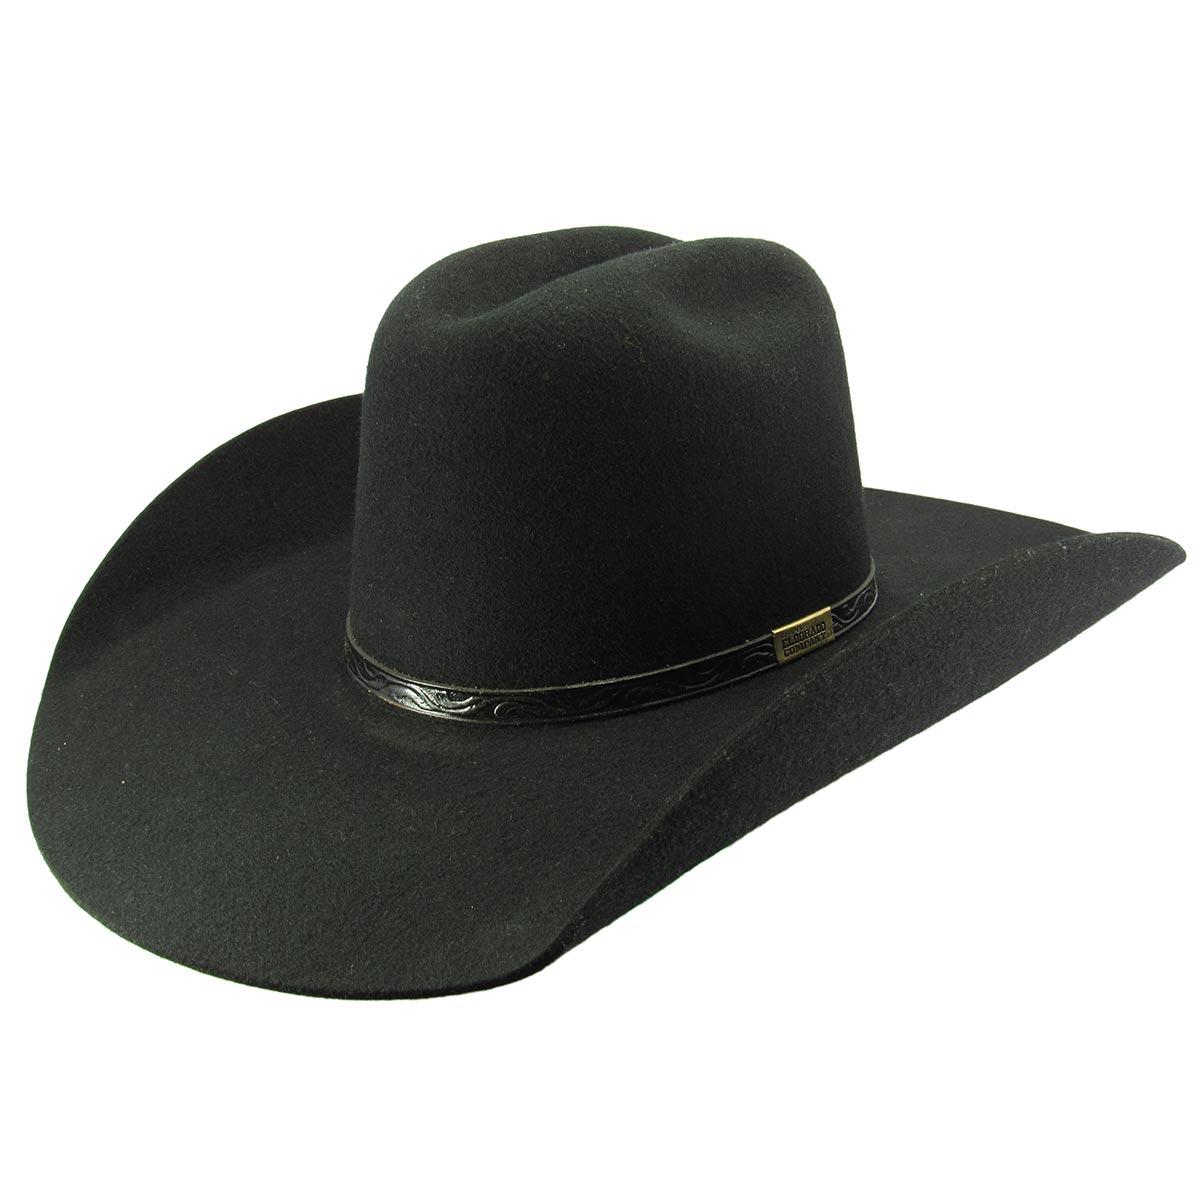 Chapéu Eldorado Lã X-treme Rodeo Feltro Preto - Cowboy BR 393b668f5fb